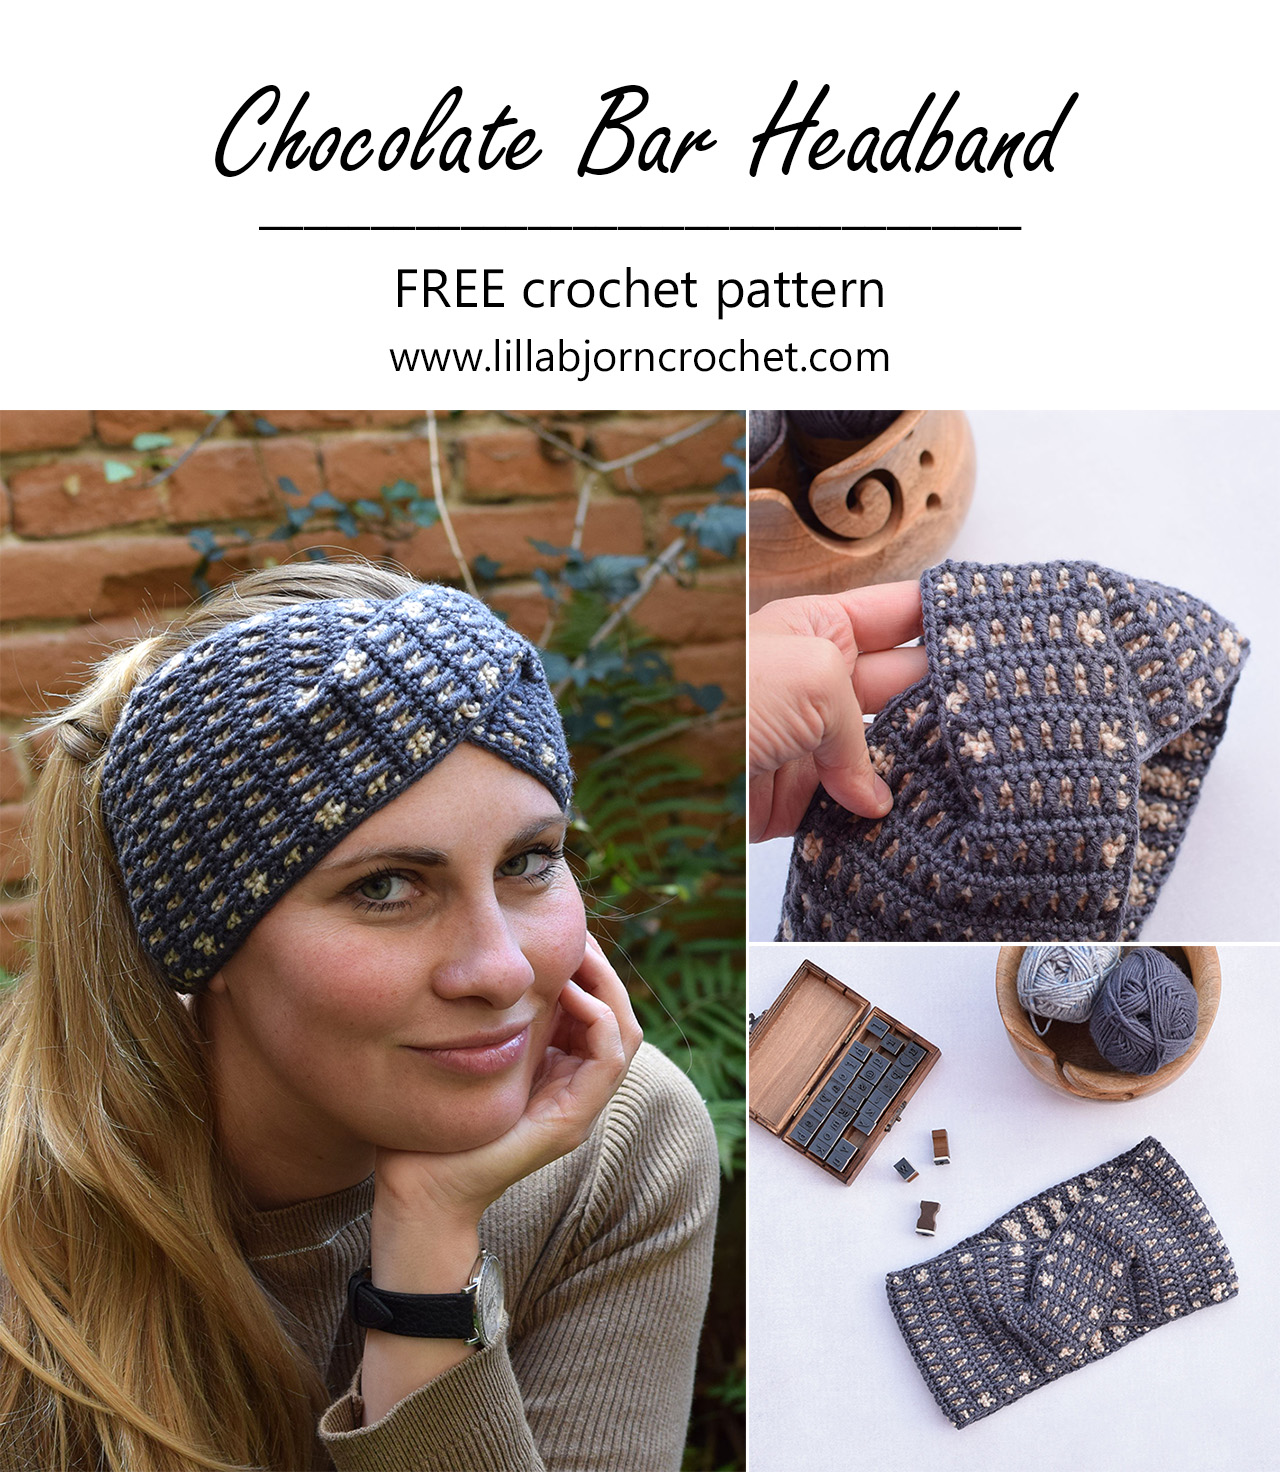 Chocolate Bar Headband Free Crochet Pattern Lillabjrns Crochet